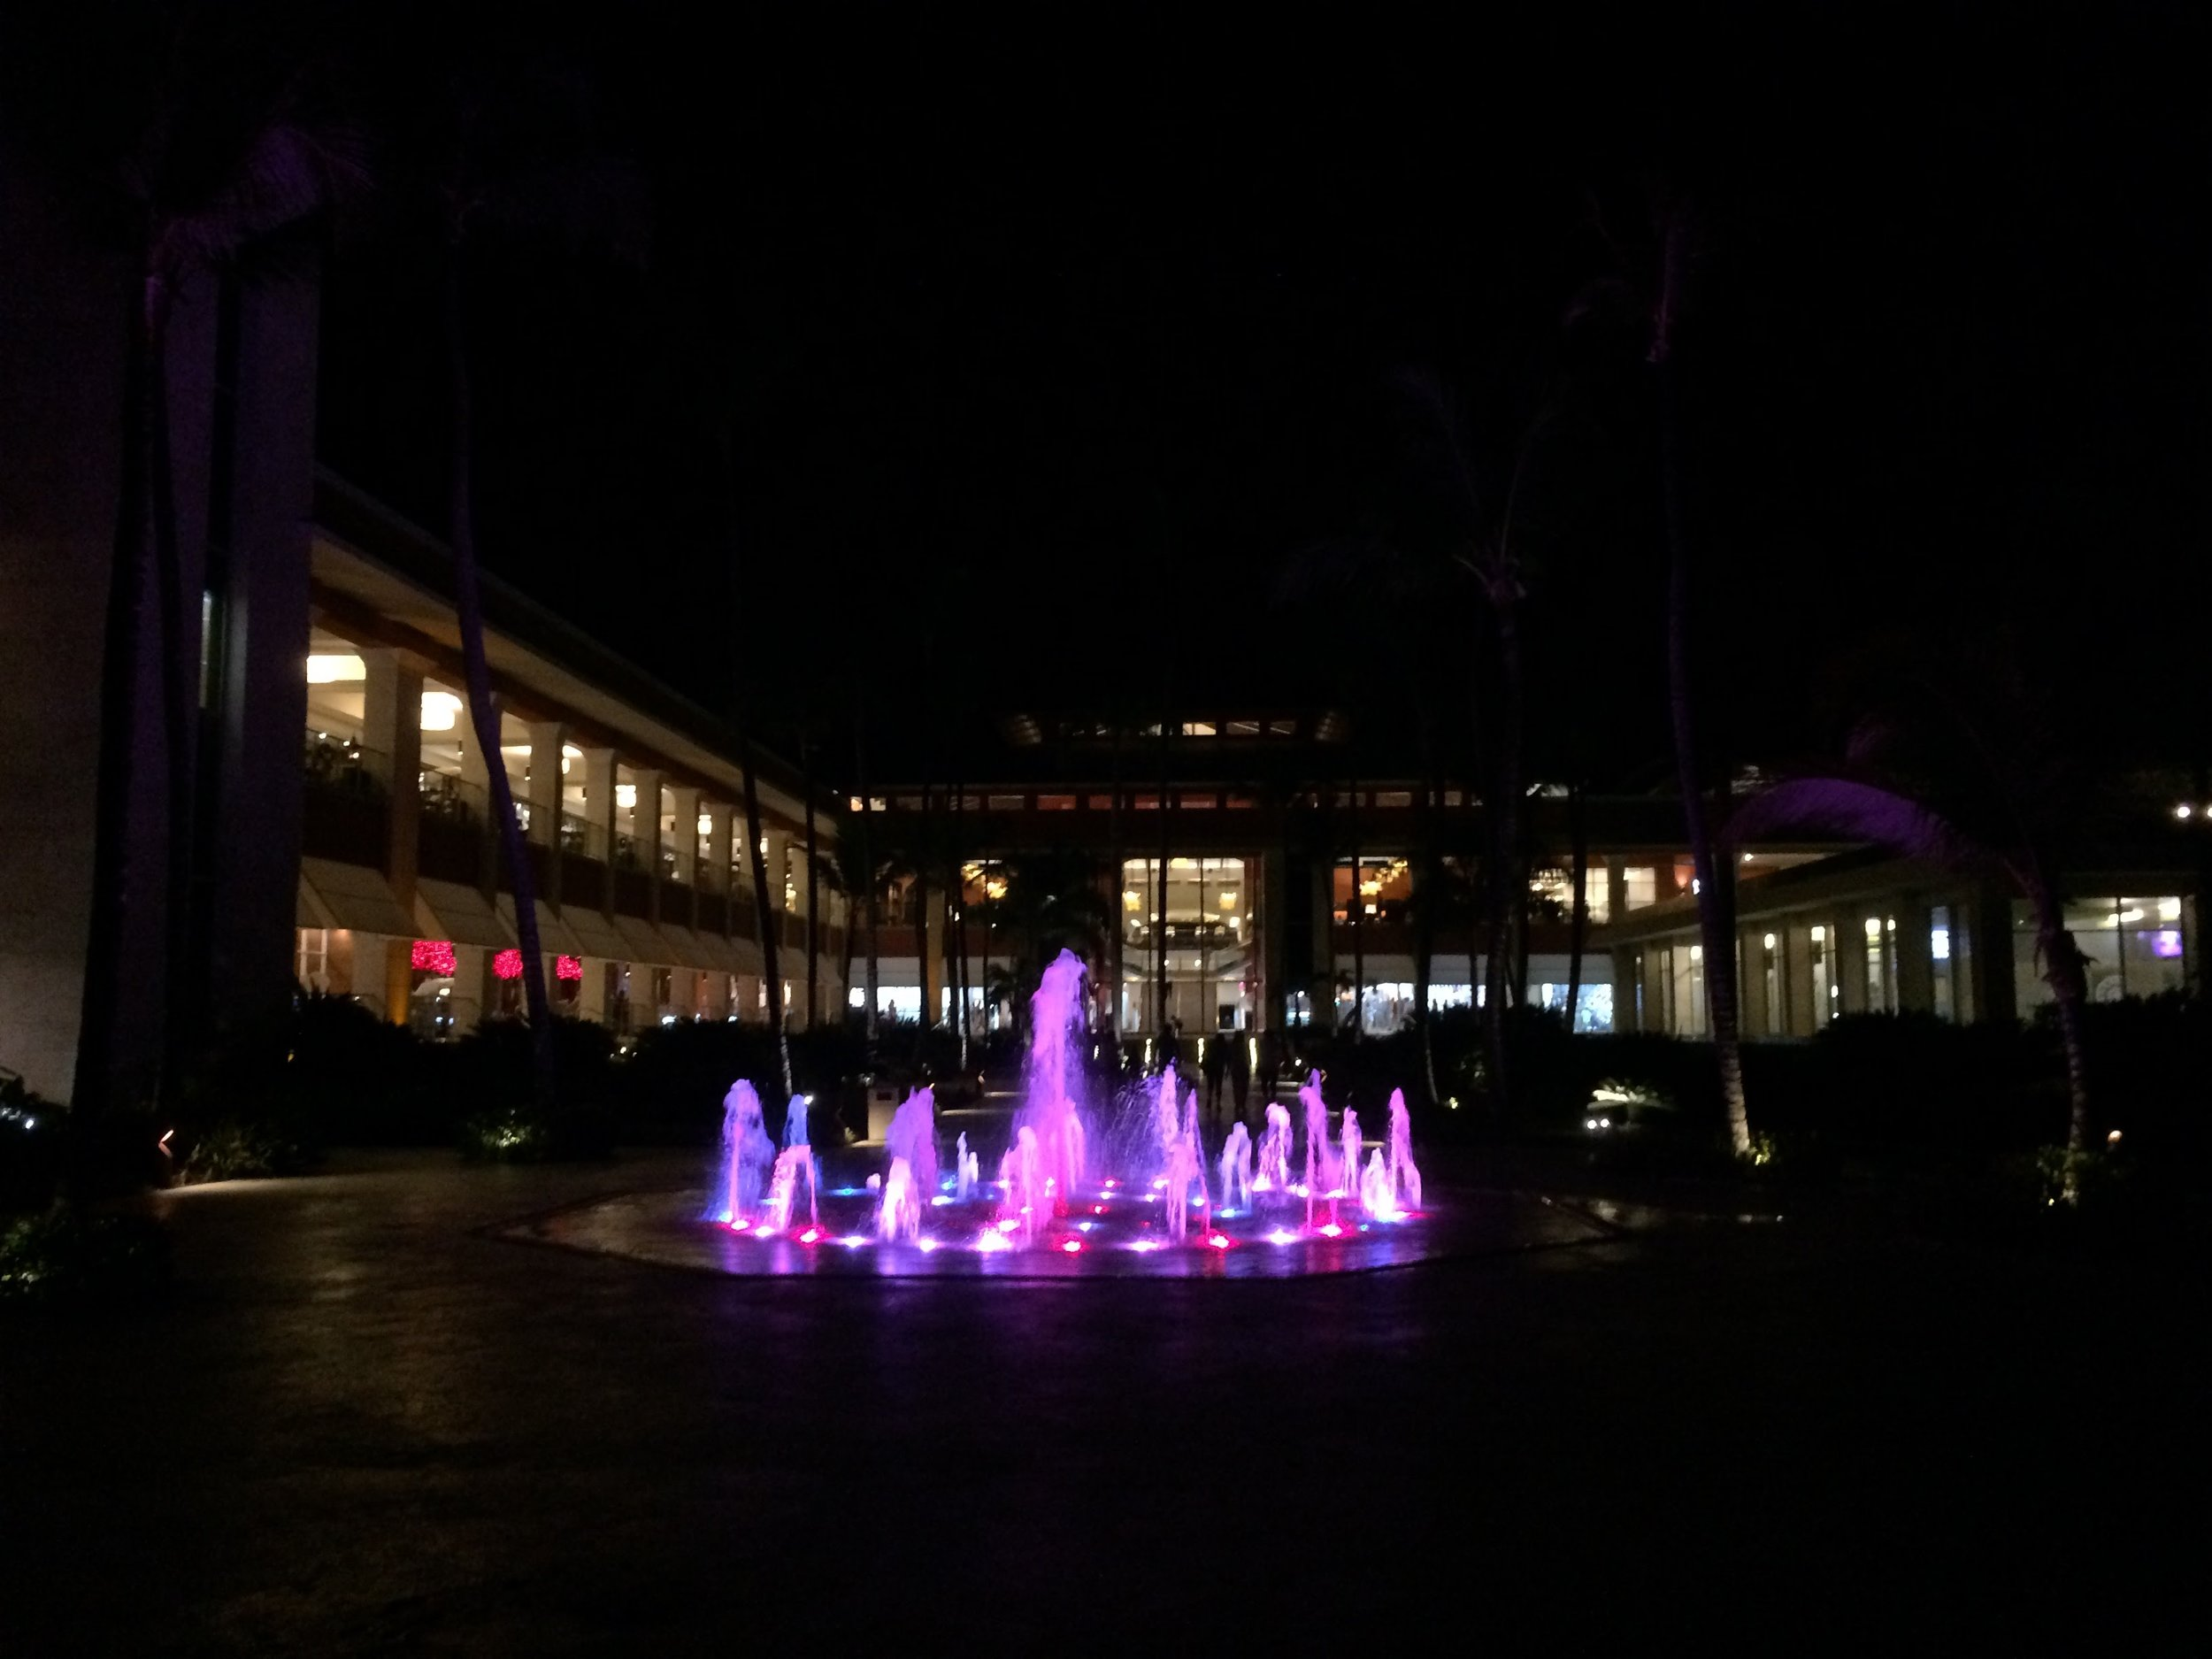 resort_front2.JPG